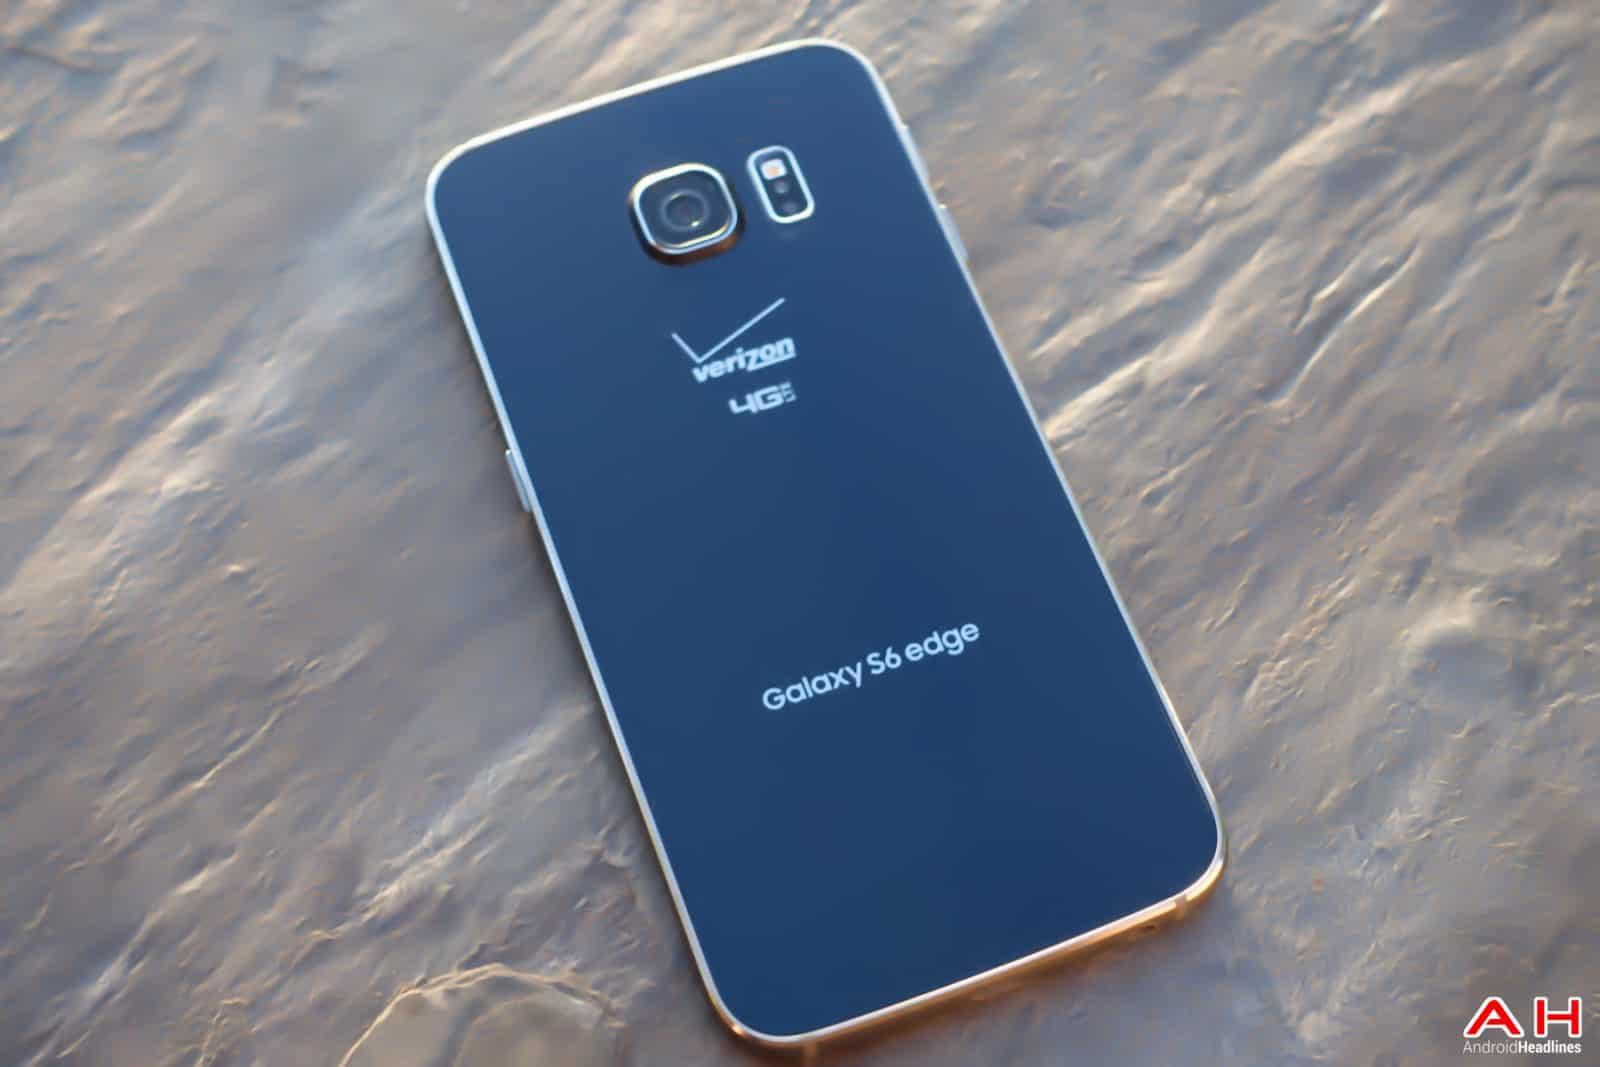 AH Samsung Galaxy S6 Edge May 3rd Batch 2-3